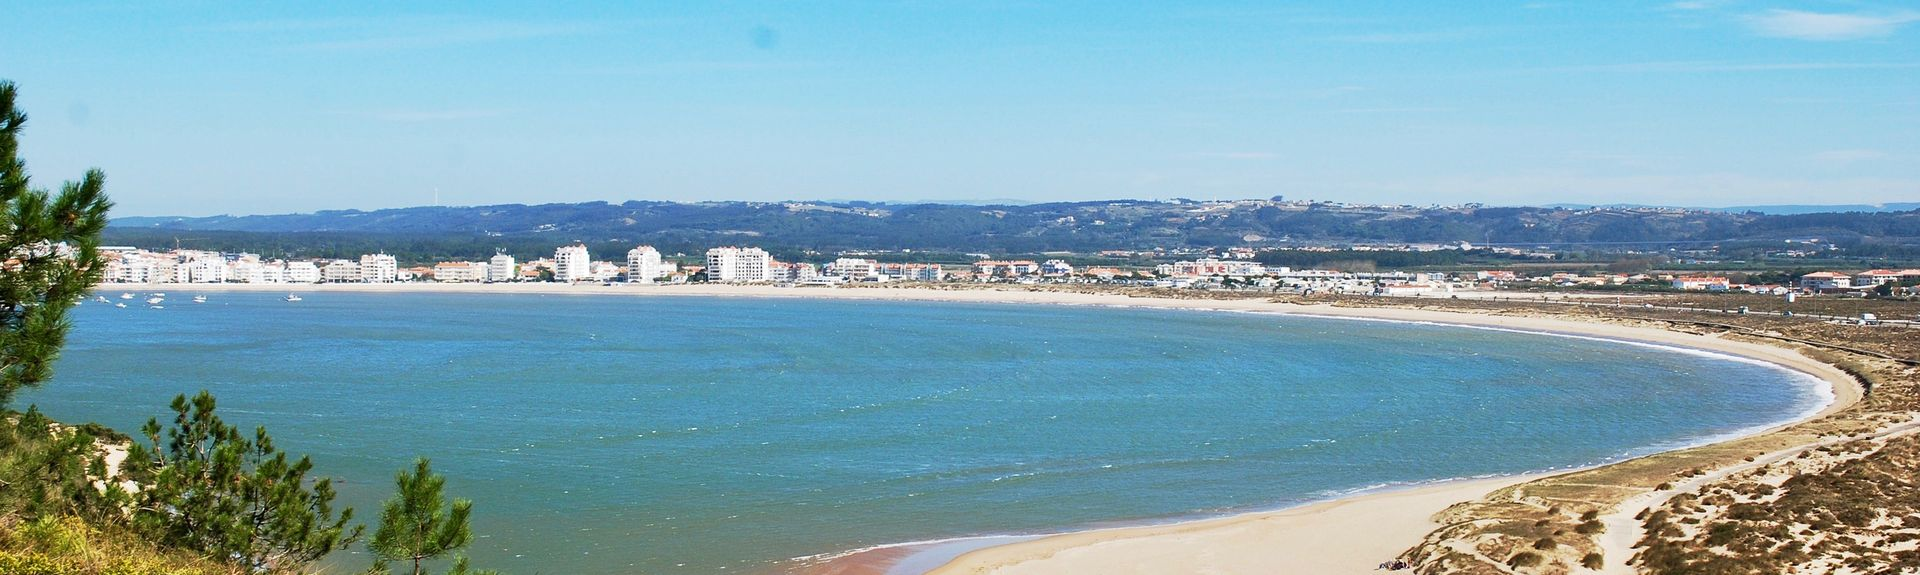 Carvalhal Benfeito, Leiria District, Portugal